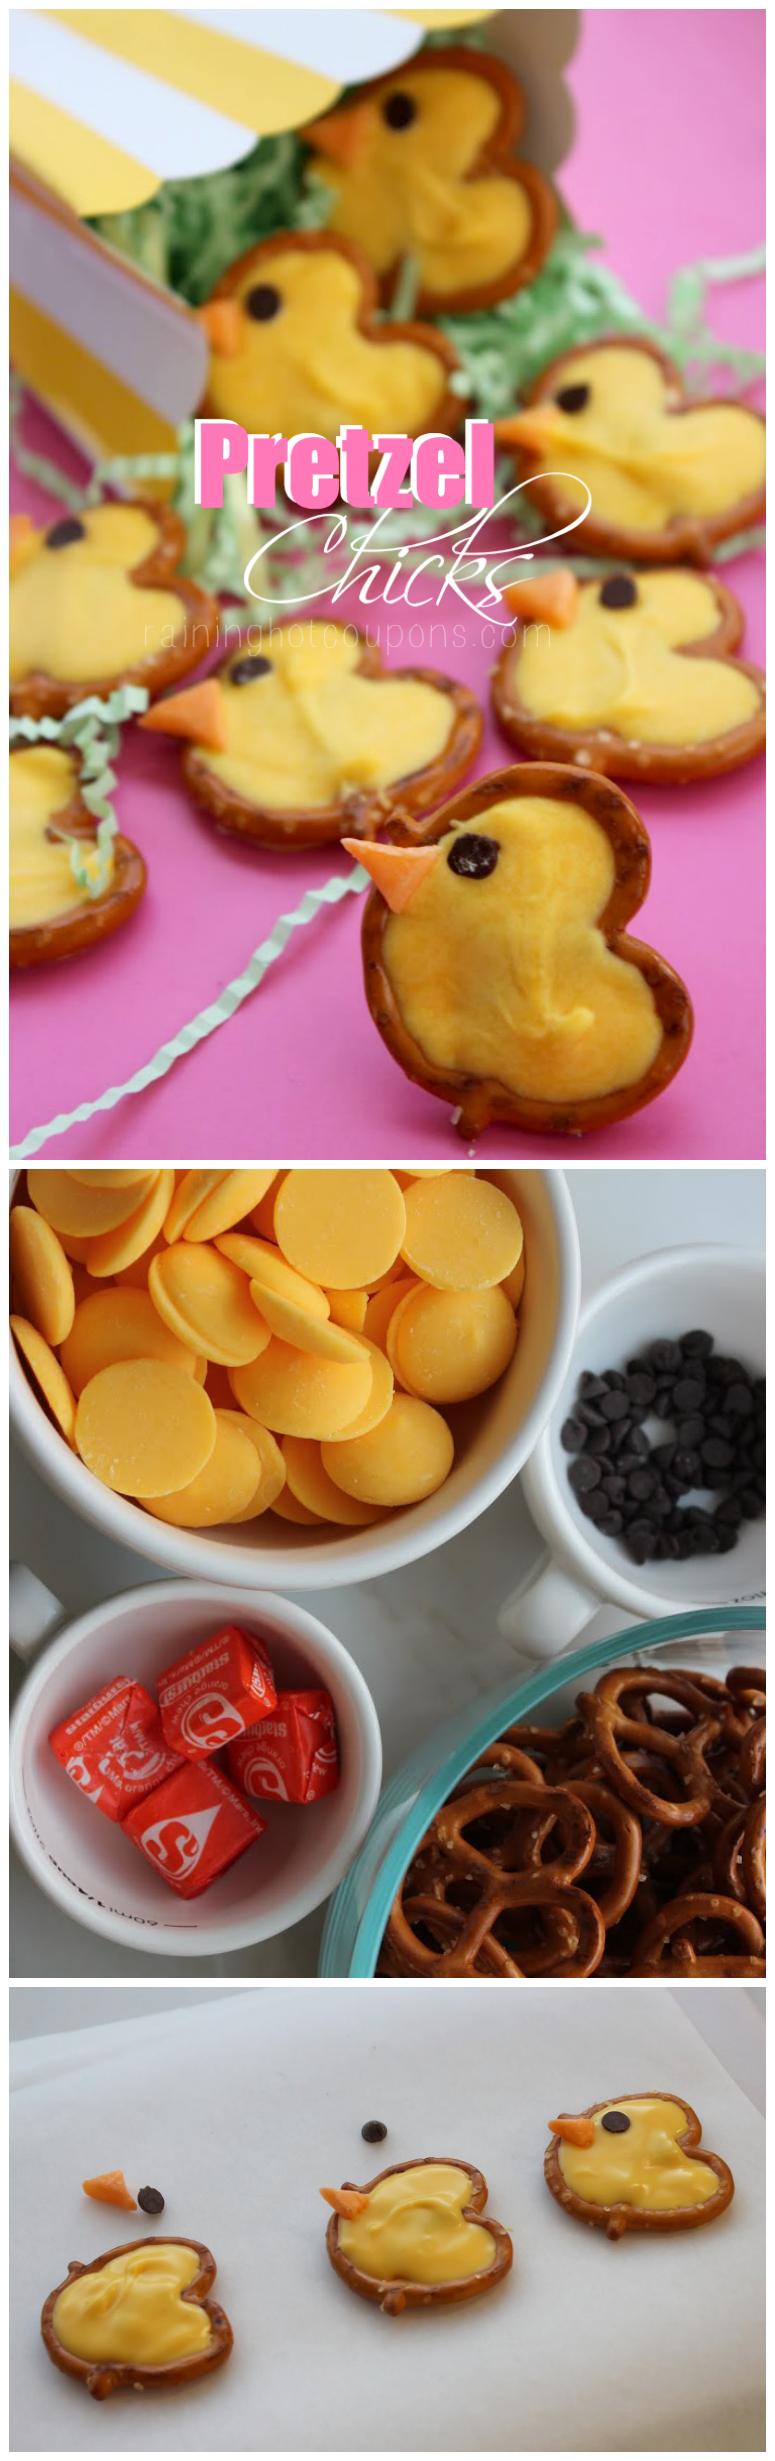 pretzel chicks.png